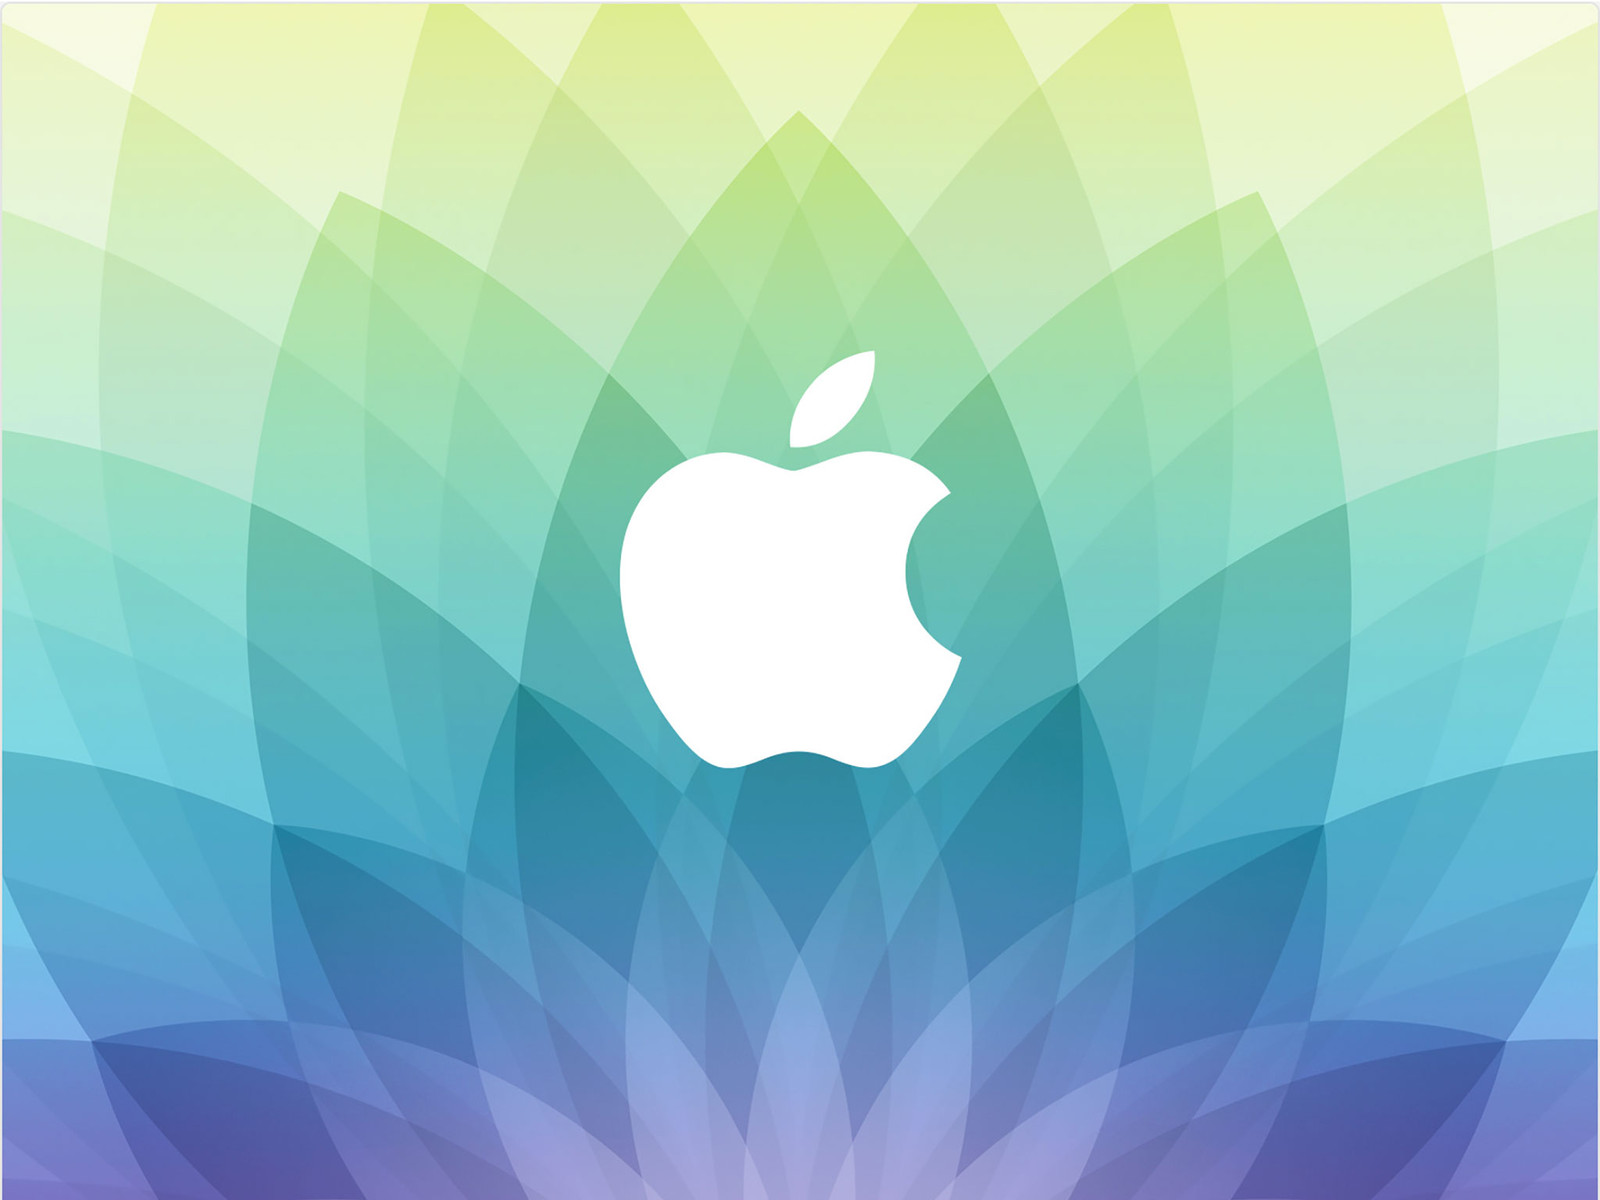 apple-spring-forward-event-logo